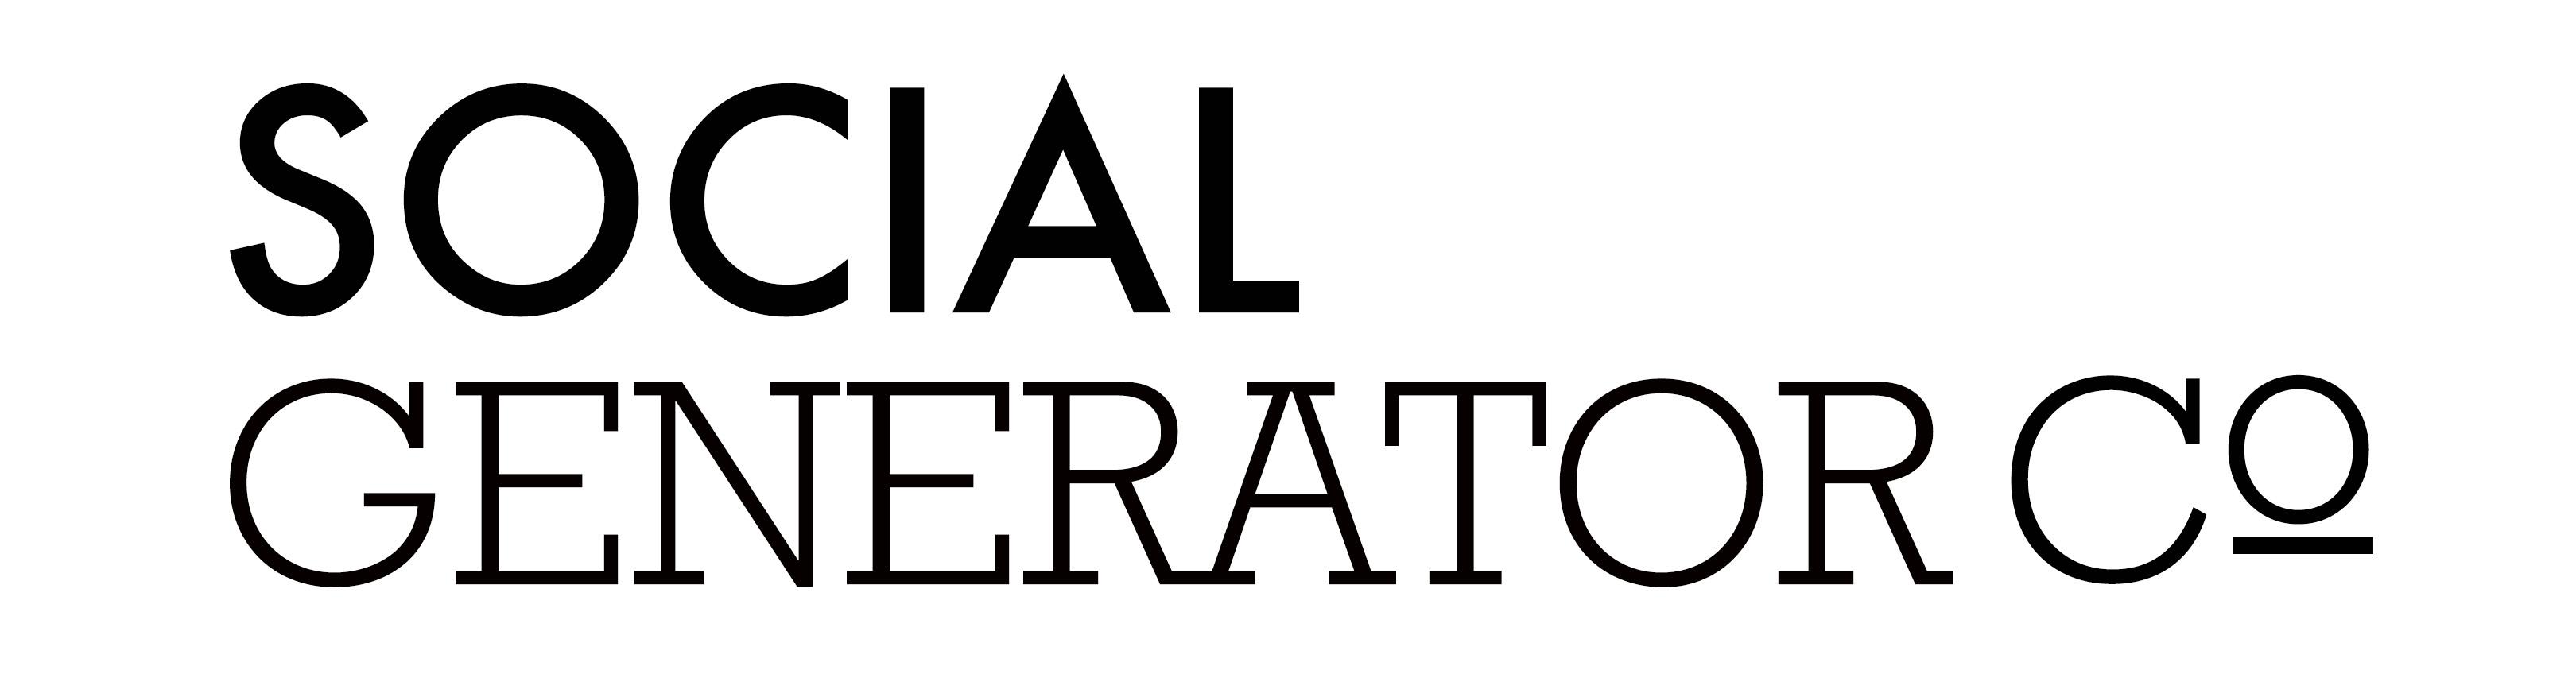 Social Generator Co.